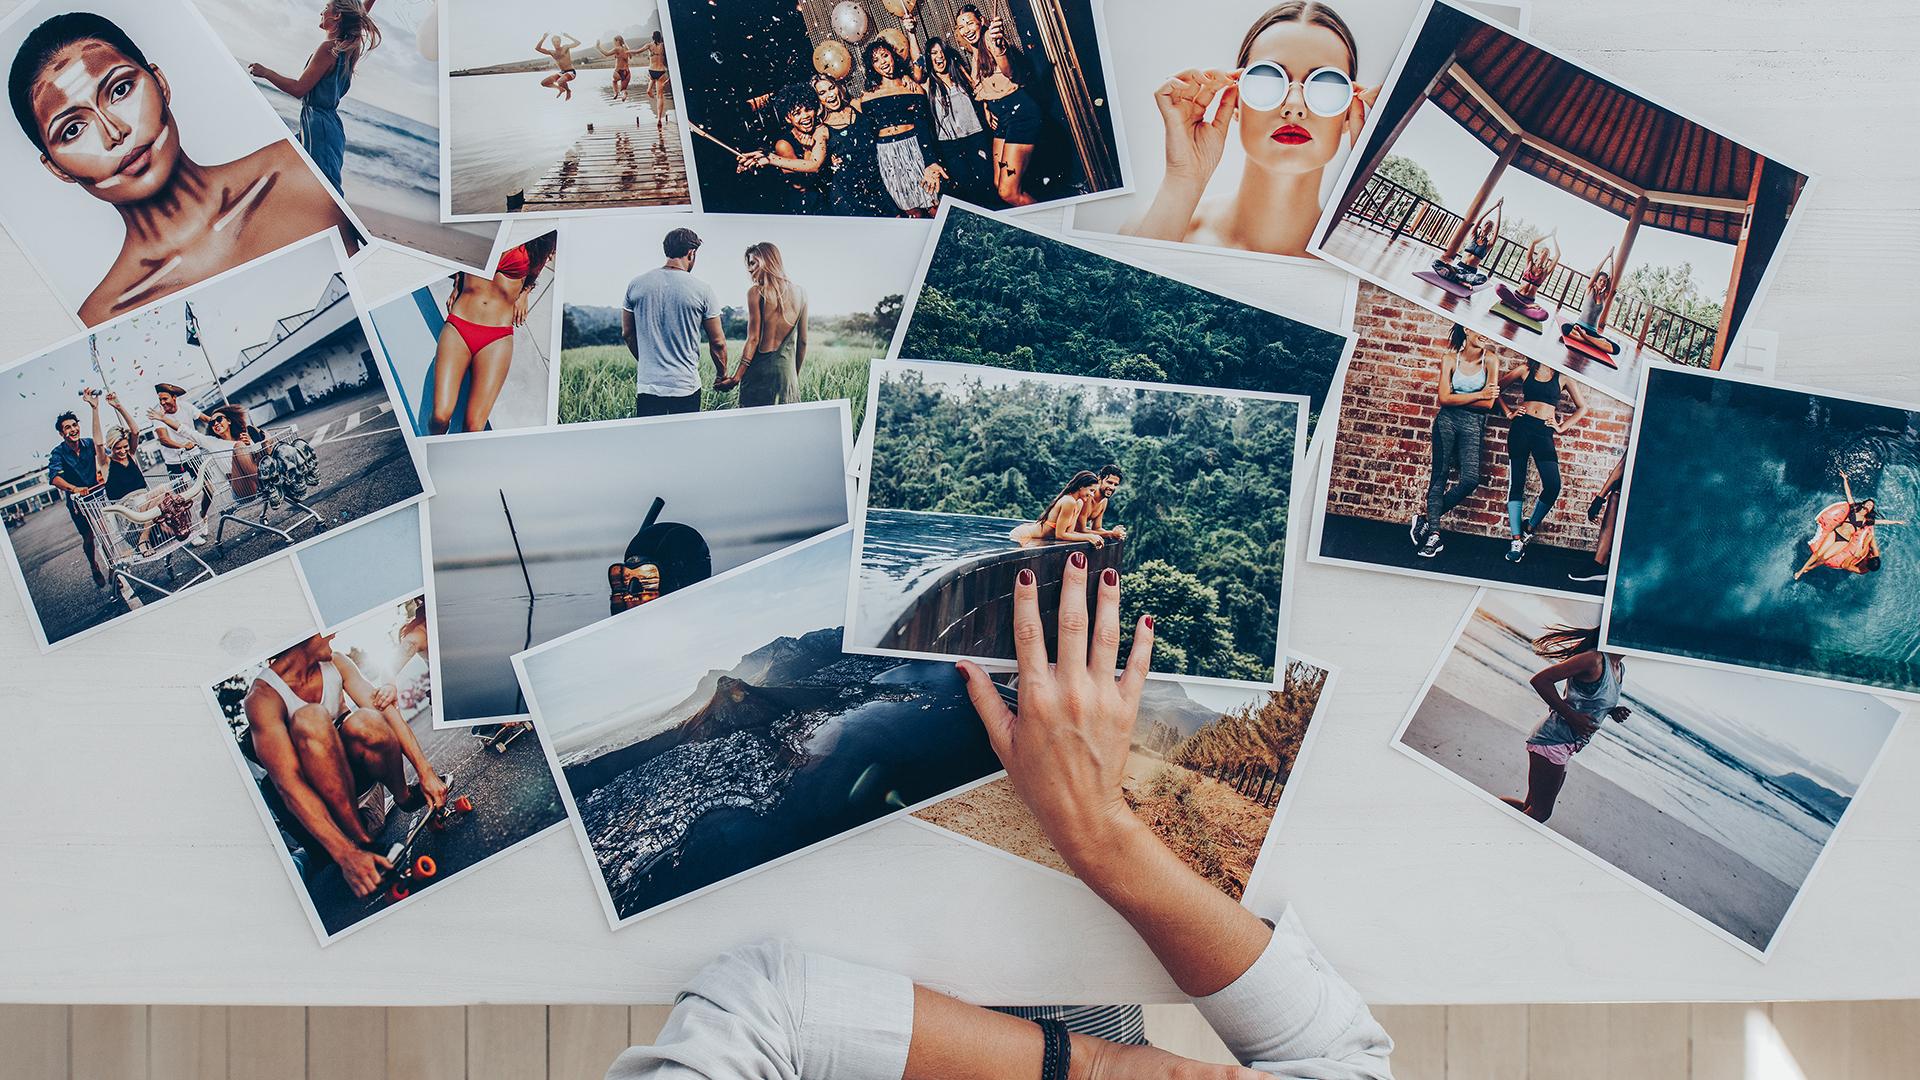 Choosing photos